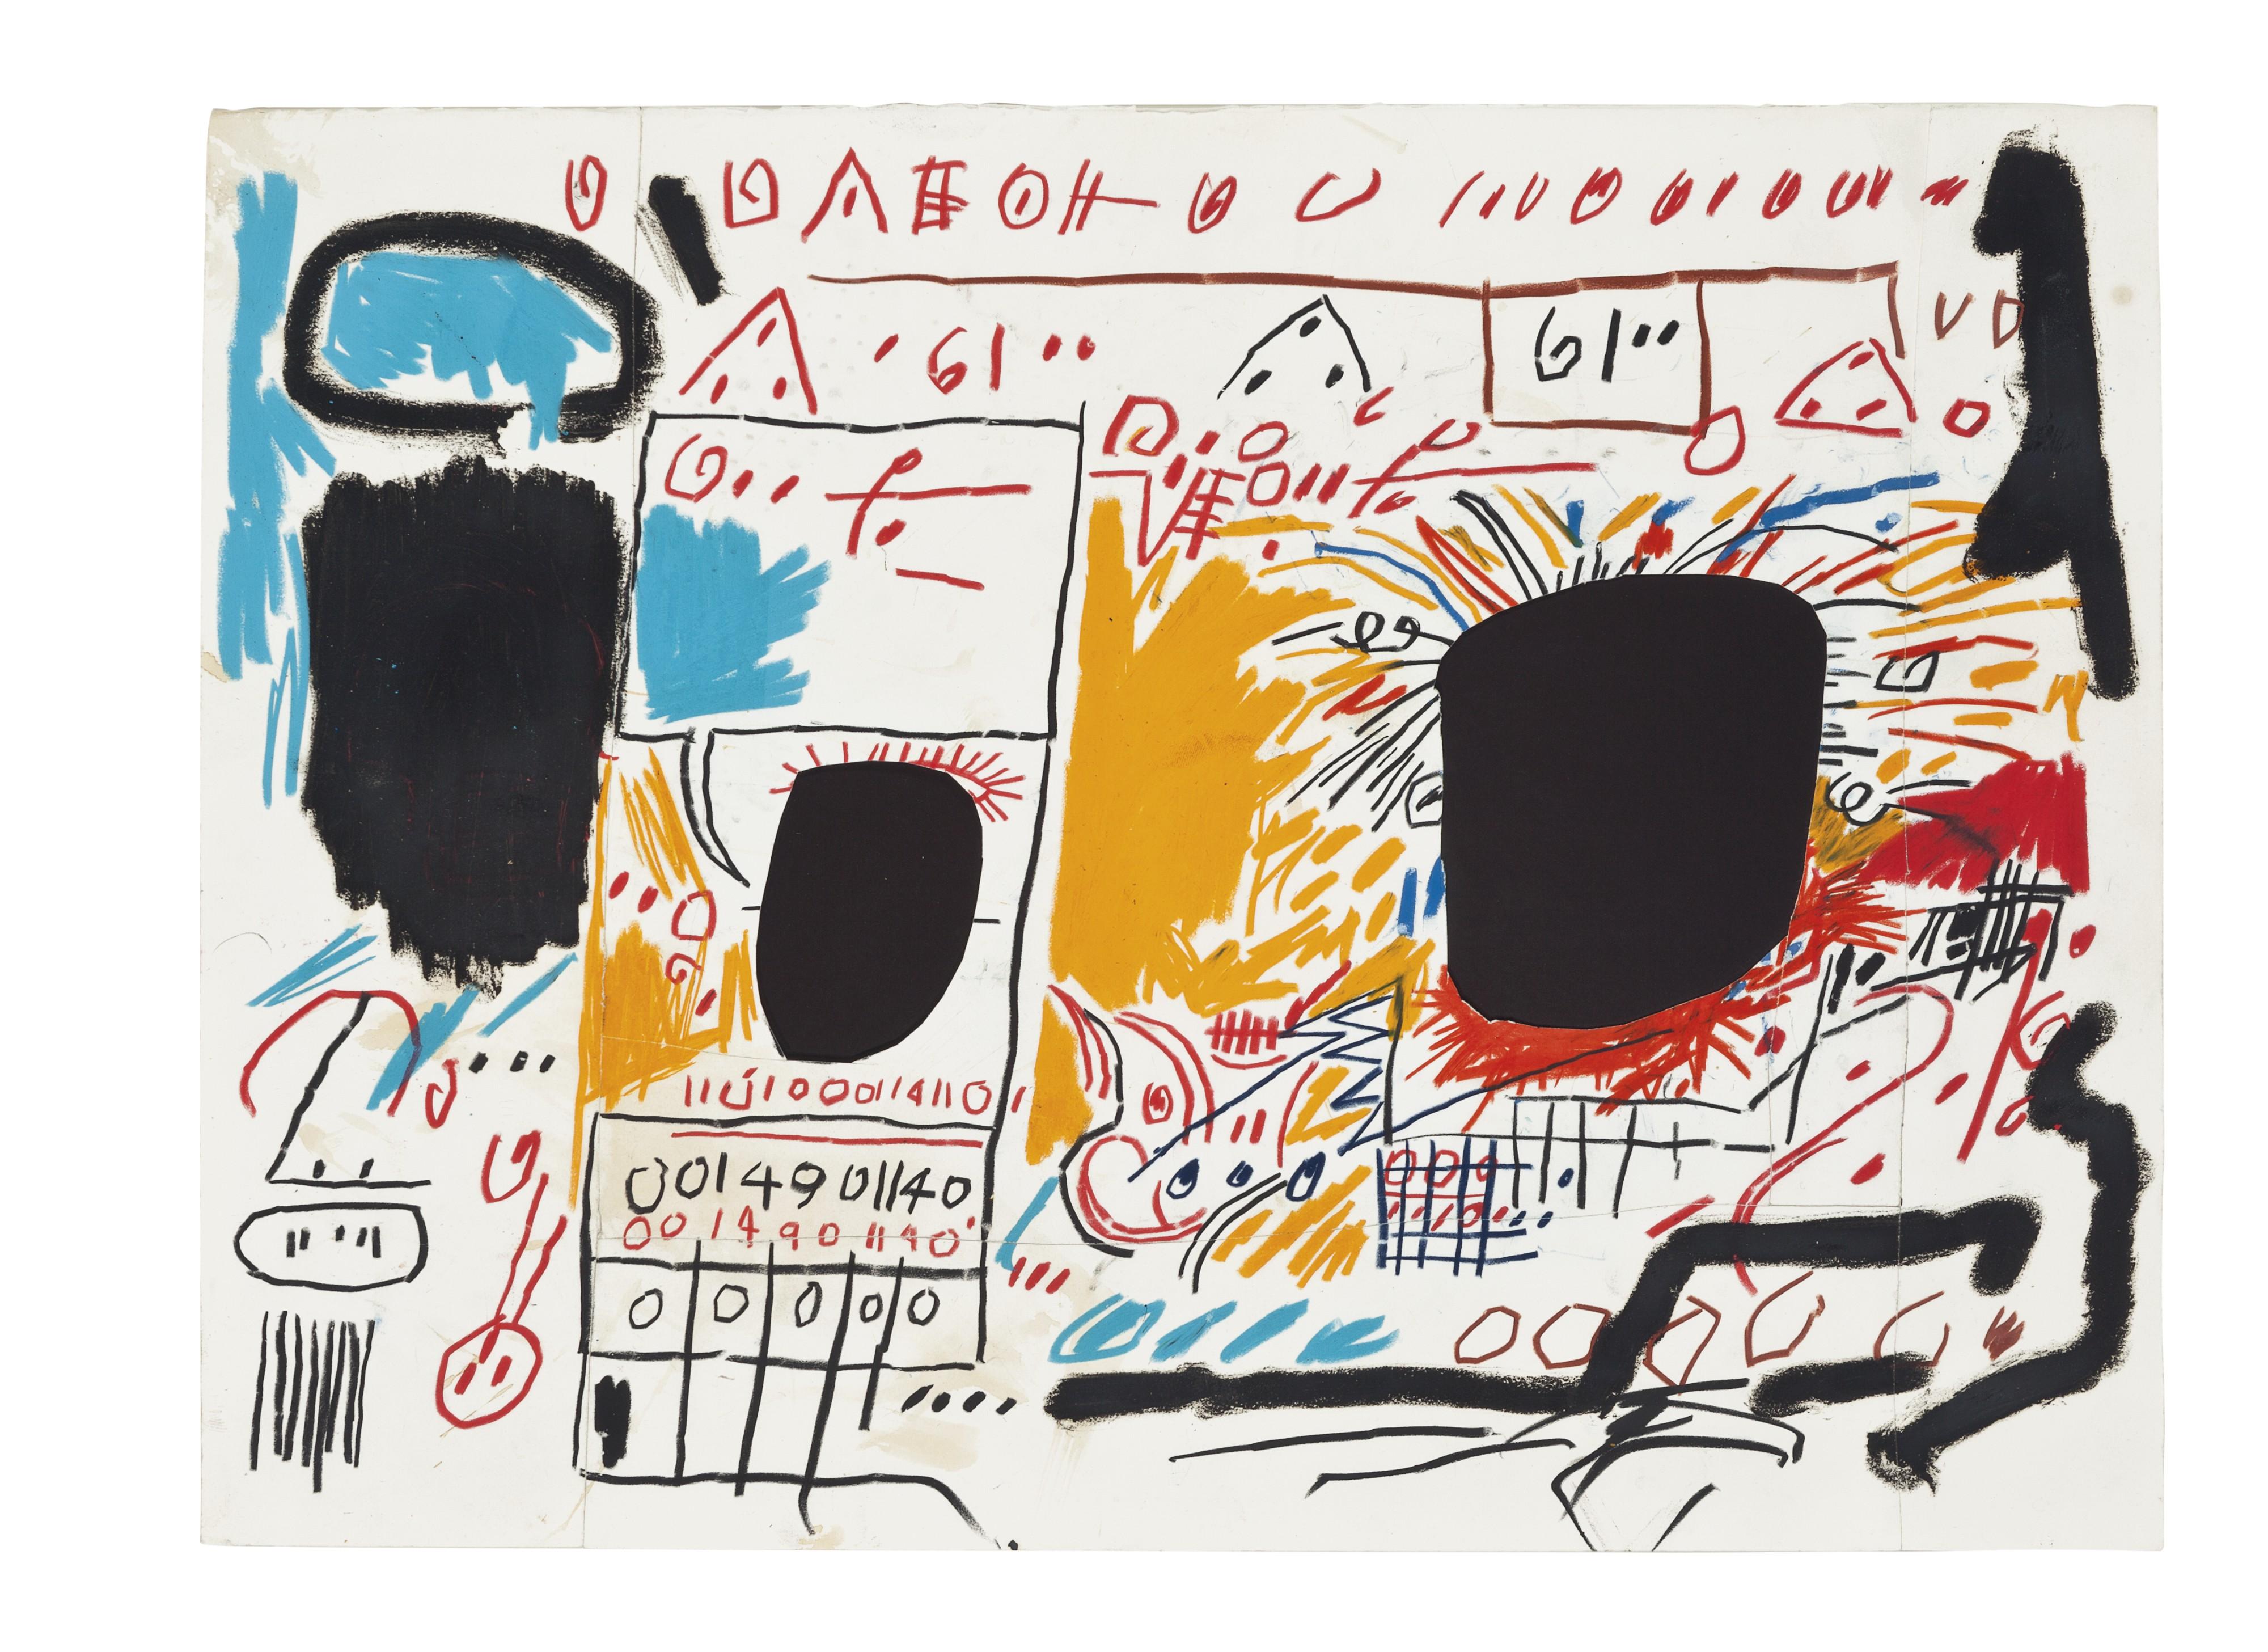 Jean-Michel Basquiat: the myth endures